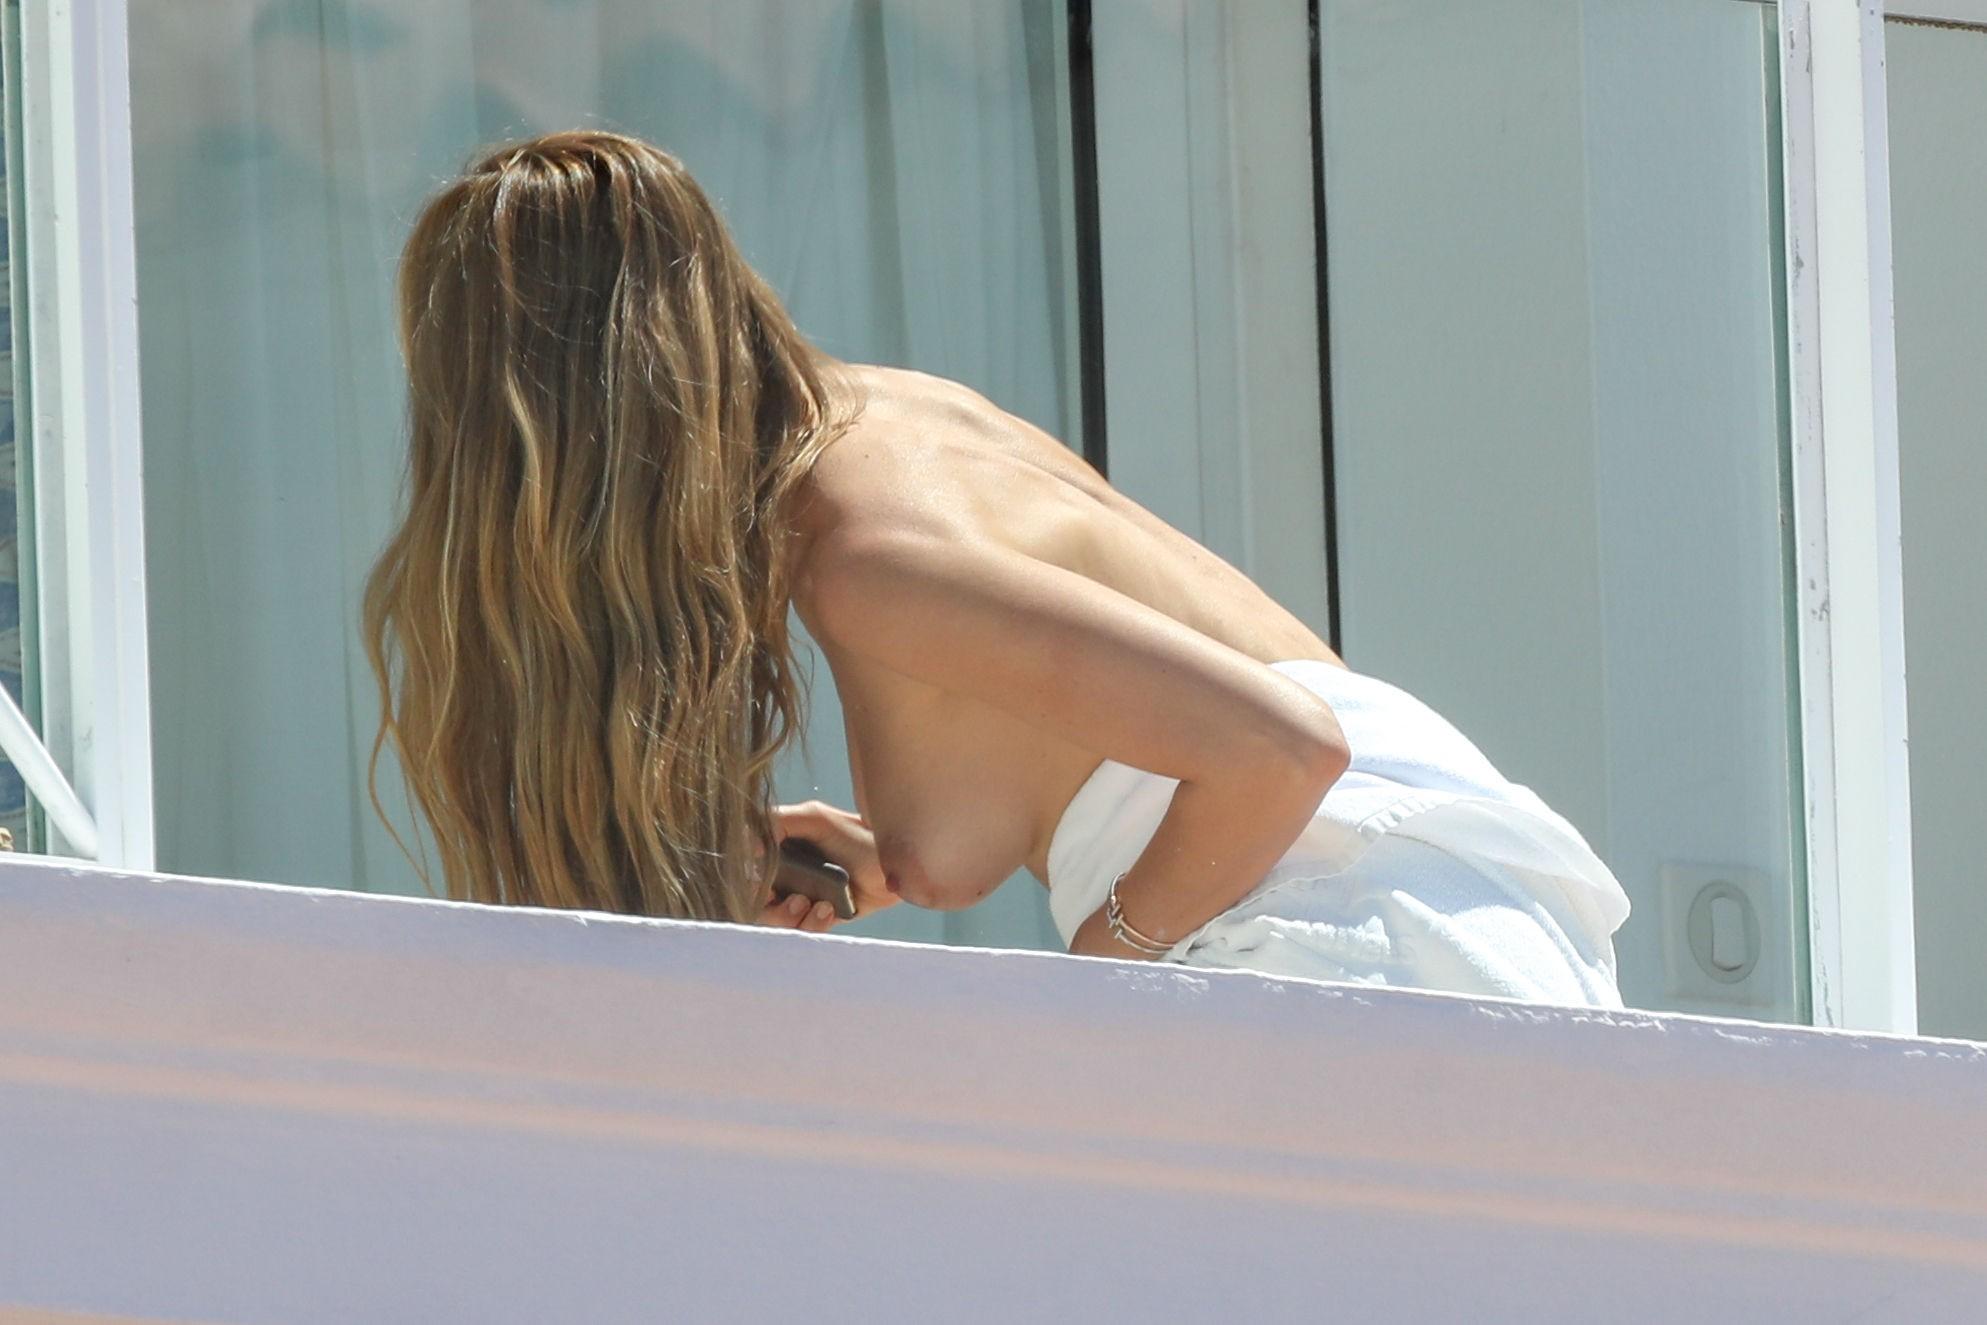 Sideboobs Nude Fiammetta Cicogna naked photo 2017